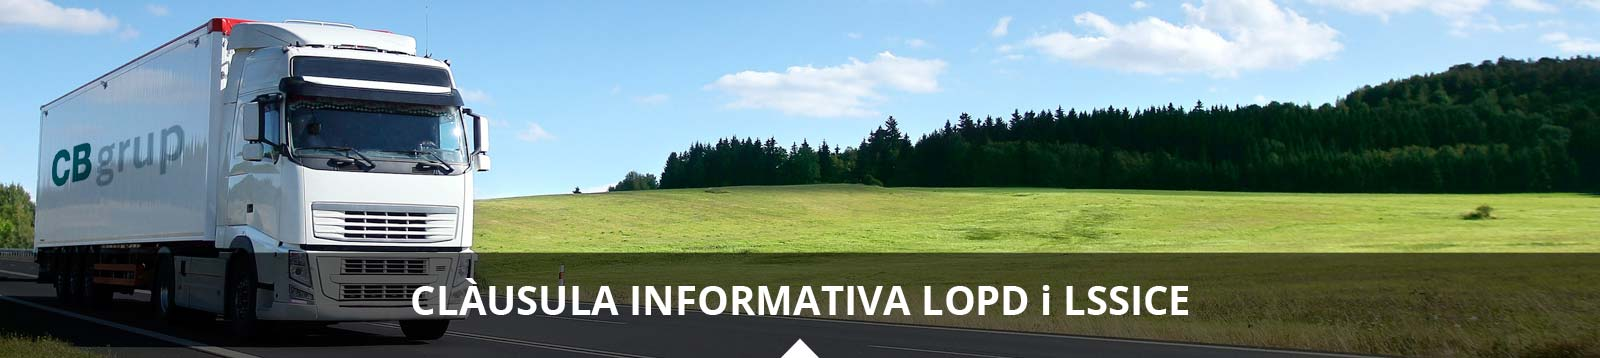 capsalera_clausula_informativa_lopd_lssice